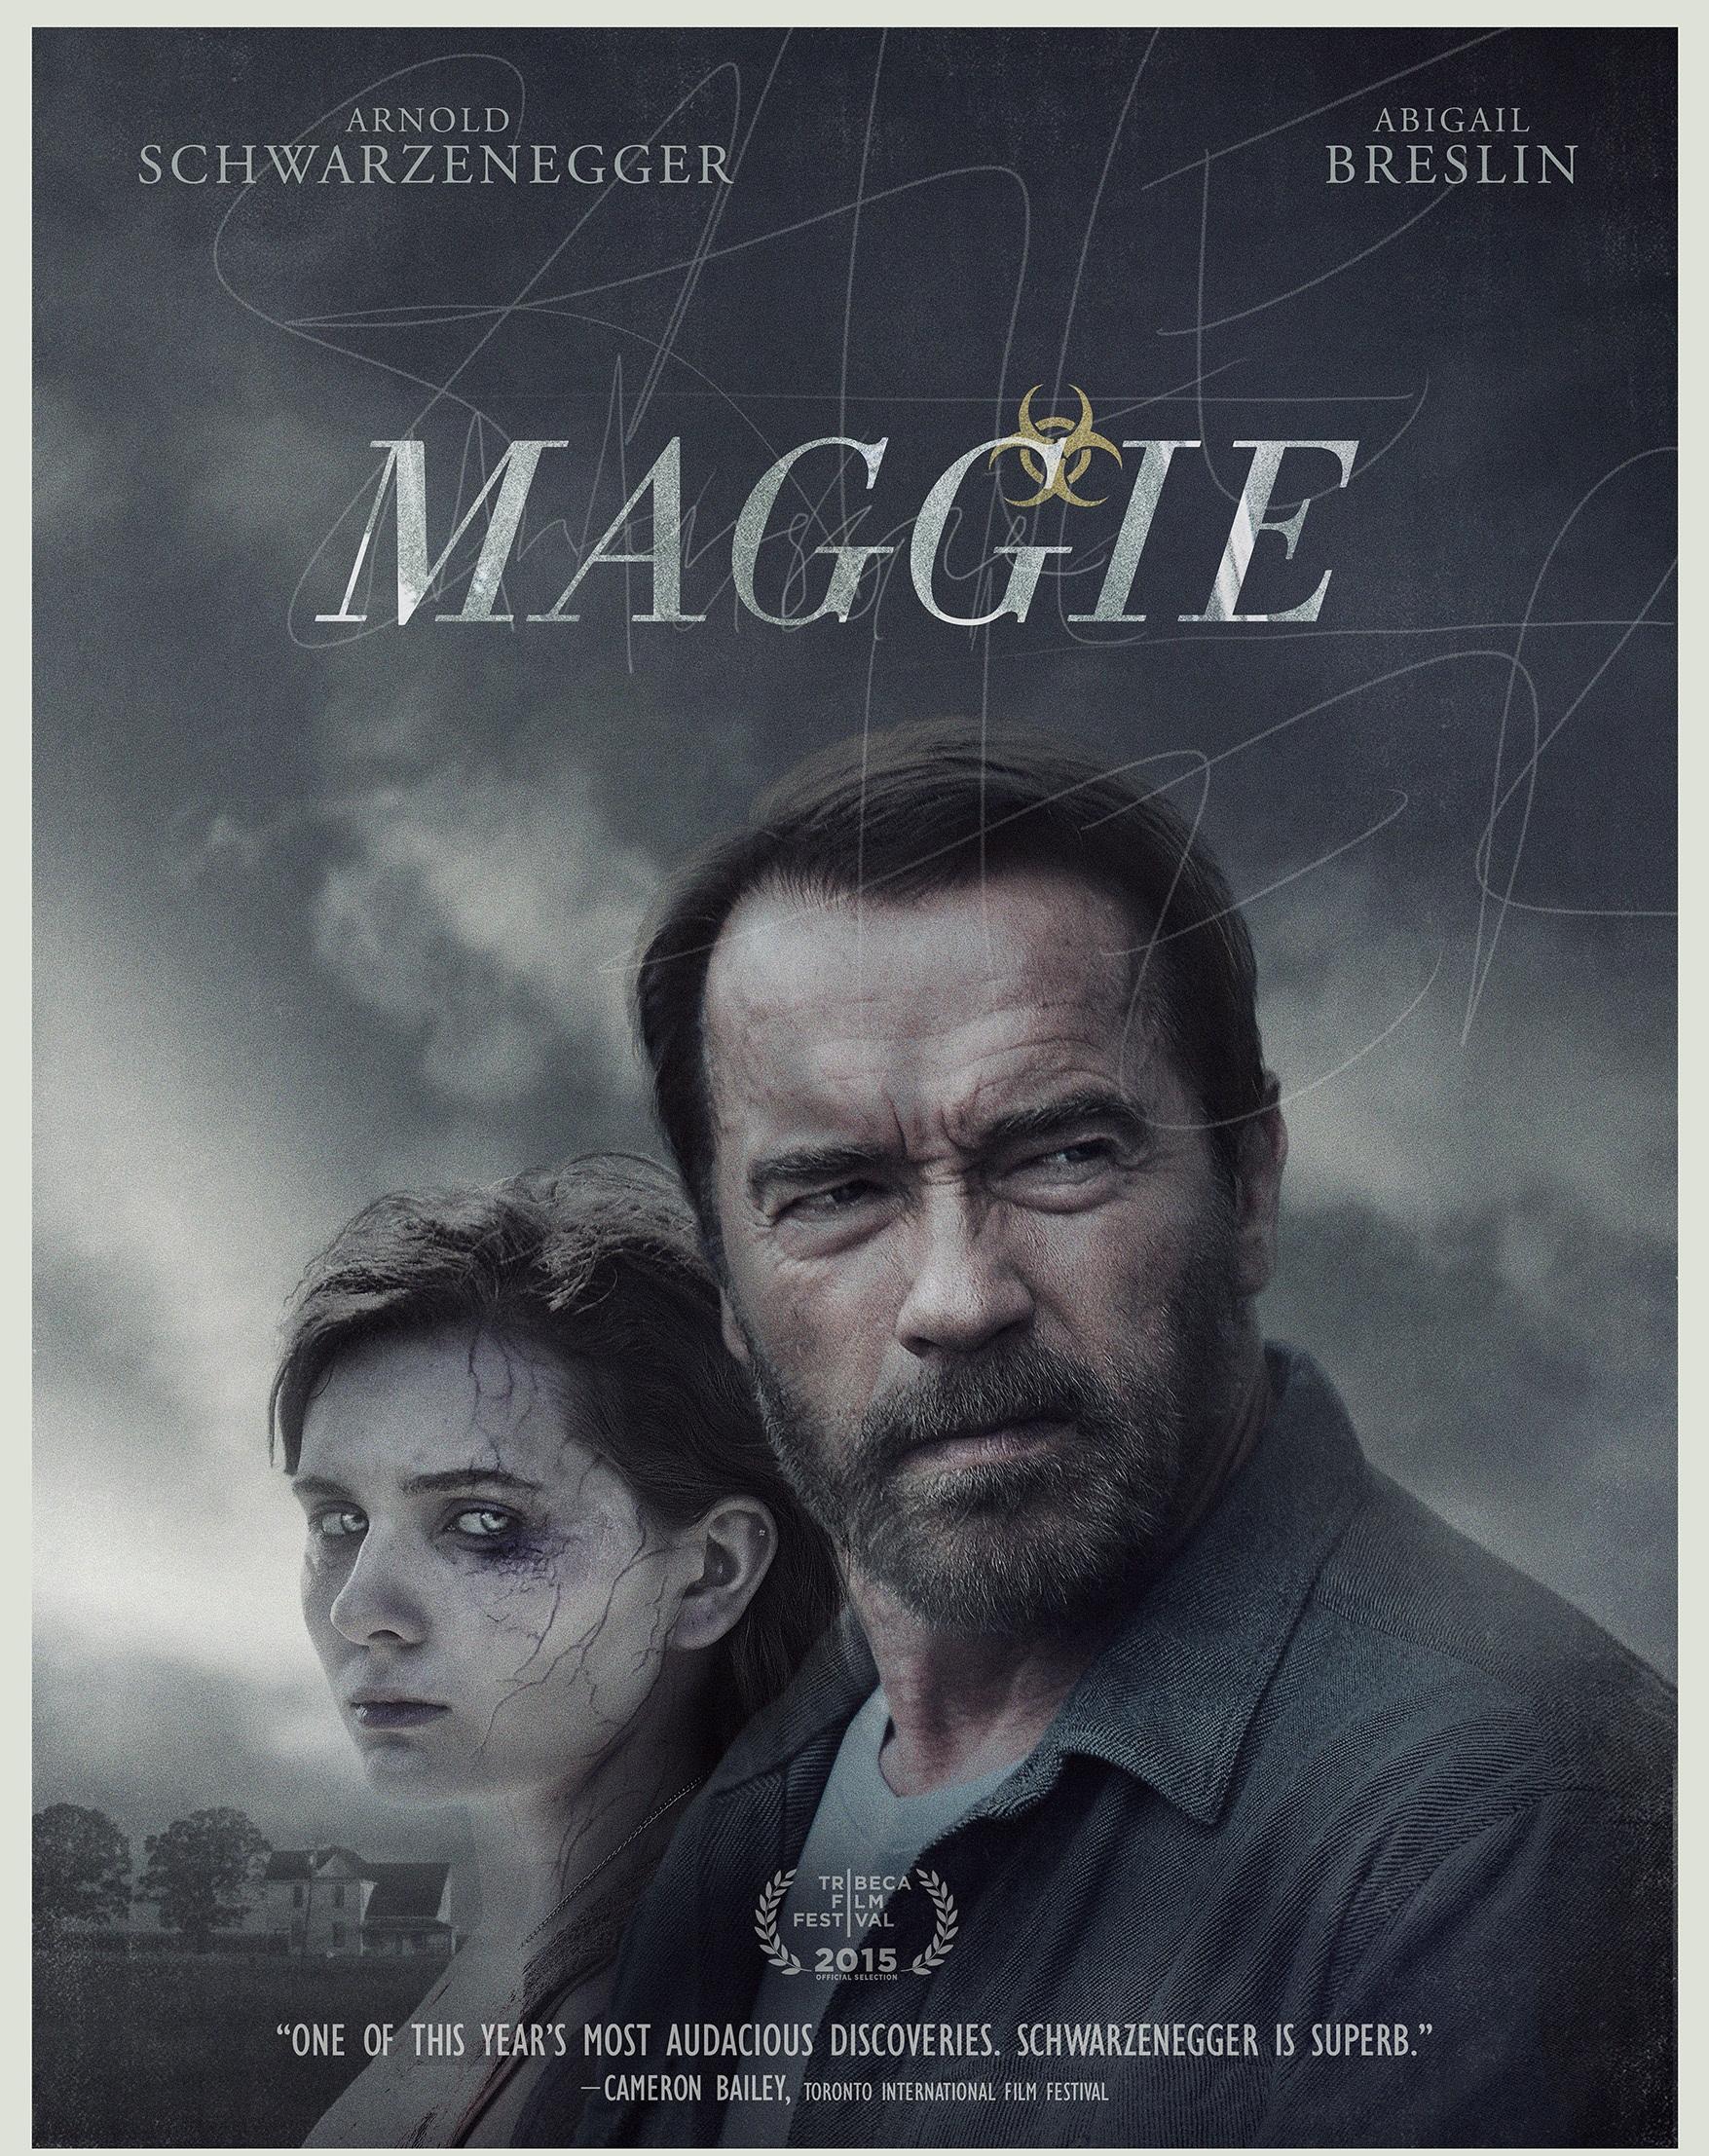 Maggie film review: Arnie faces the zombie apocalypse